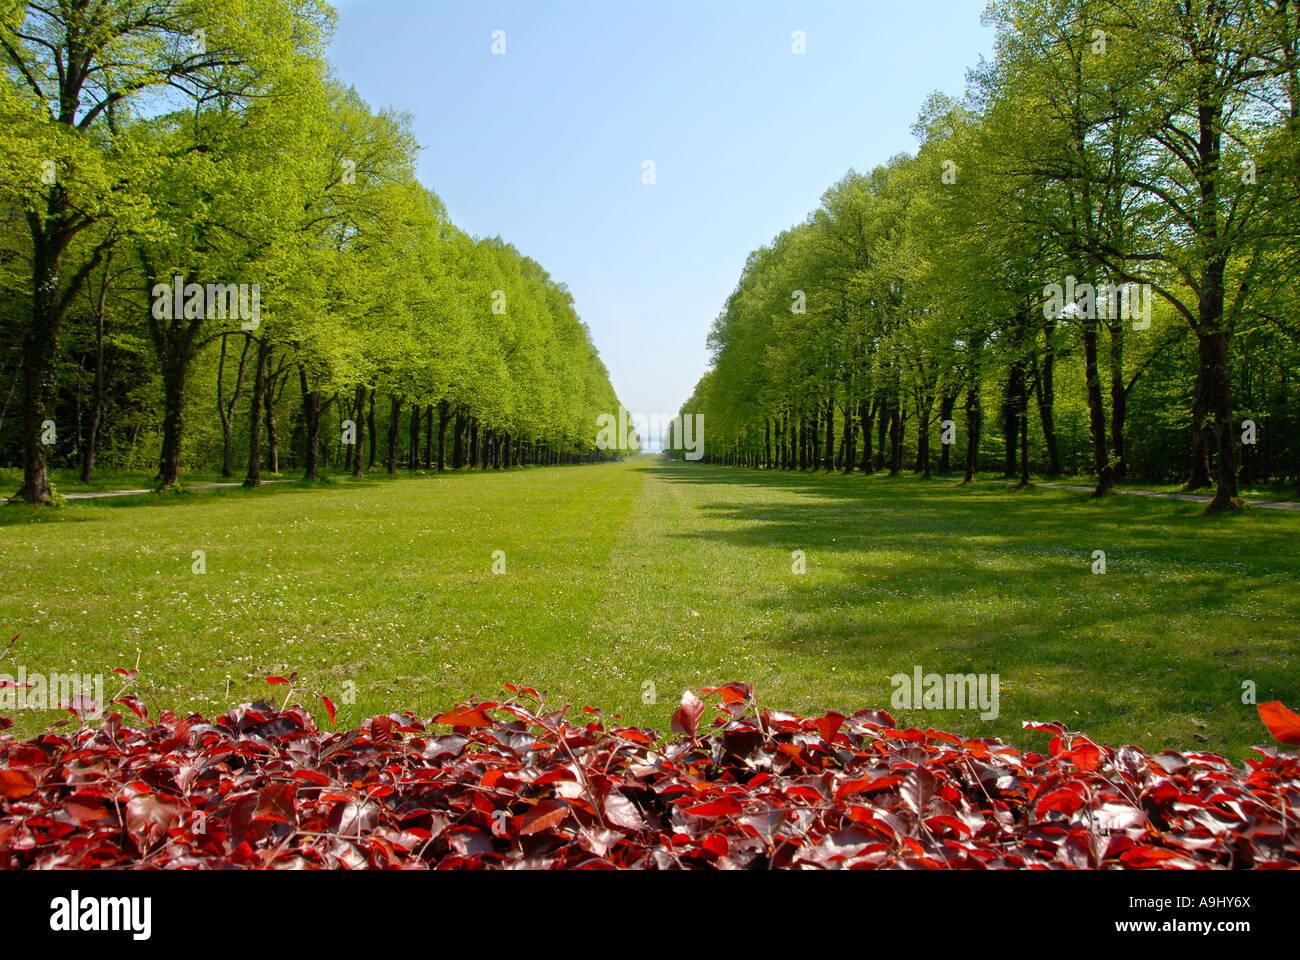 Parc avec pelouse dans l'allée forestière à Schloss Herrenchiemsee Herreninsel Chiemsee Allemagne Photo Stock